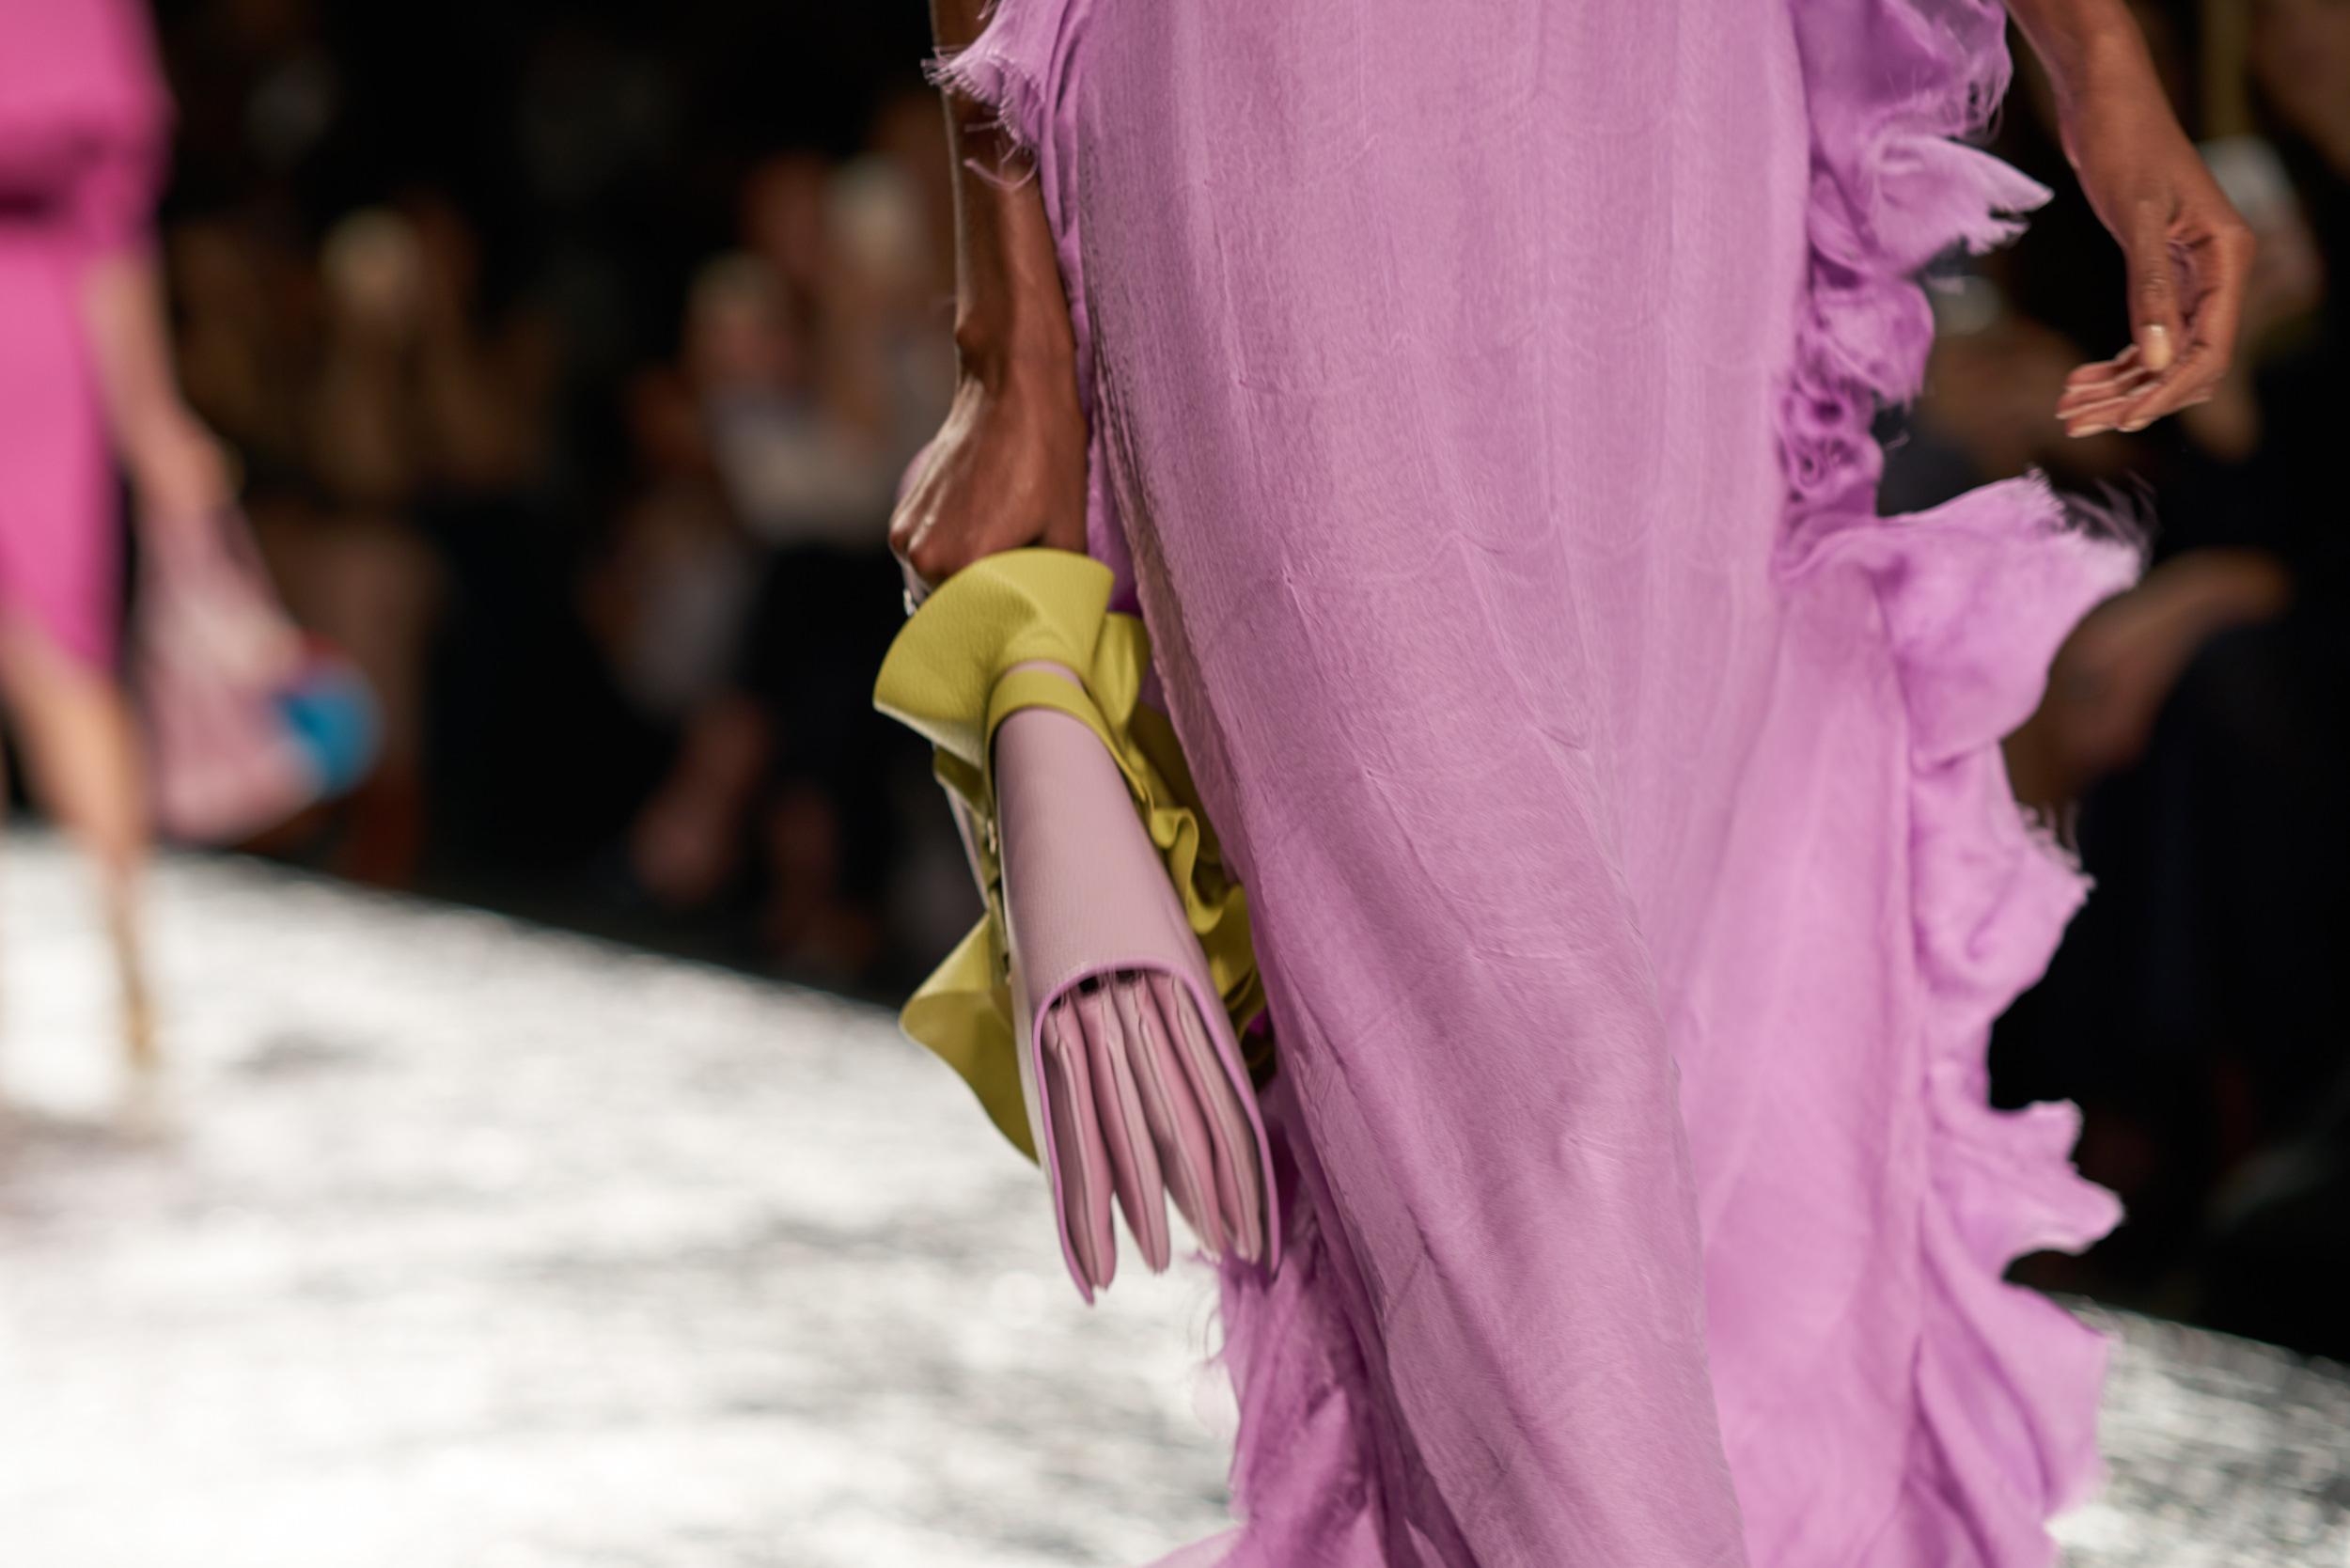 aigner, milan, milano fashion week, aigner munich, milano moda haftası